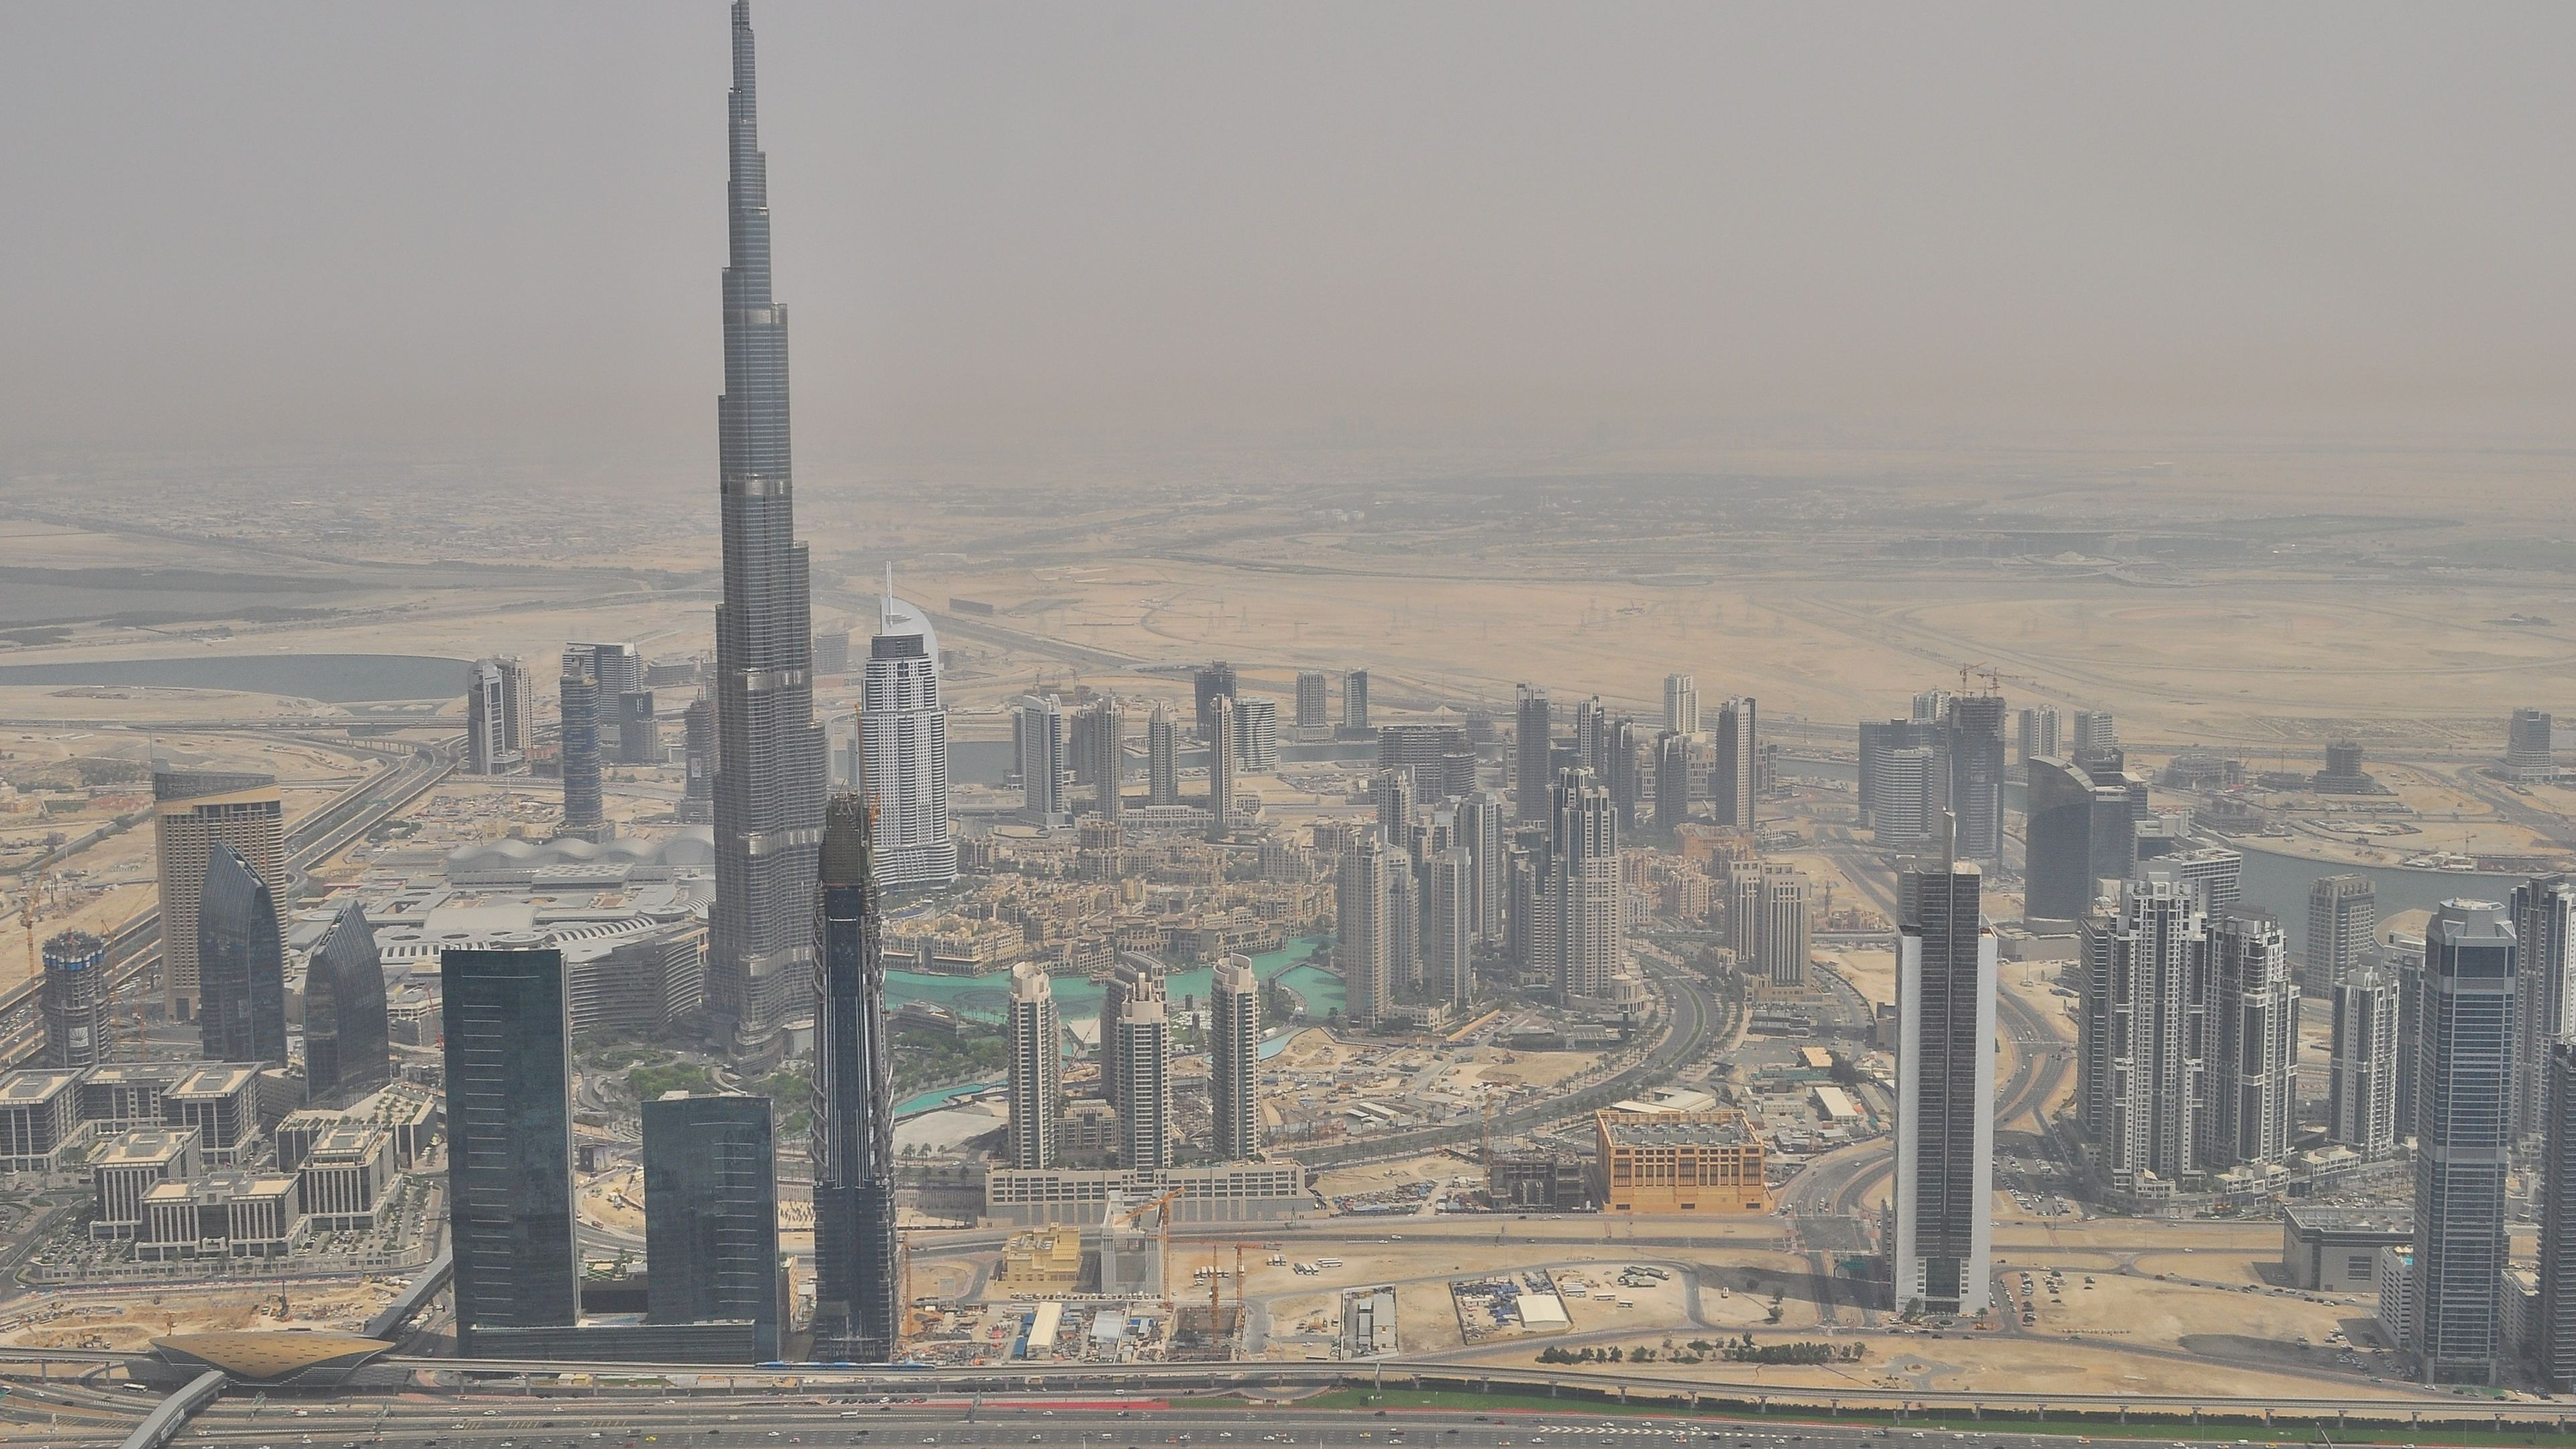 burj khalifa dubai 4k 1538072084 - Burj Khalifa Dubai 4k - world wallpapers, hd-wallpapers, dubai wallpapers, burj khalifa wallpapers, buildings wallpapers, 4k-wallpapers